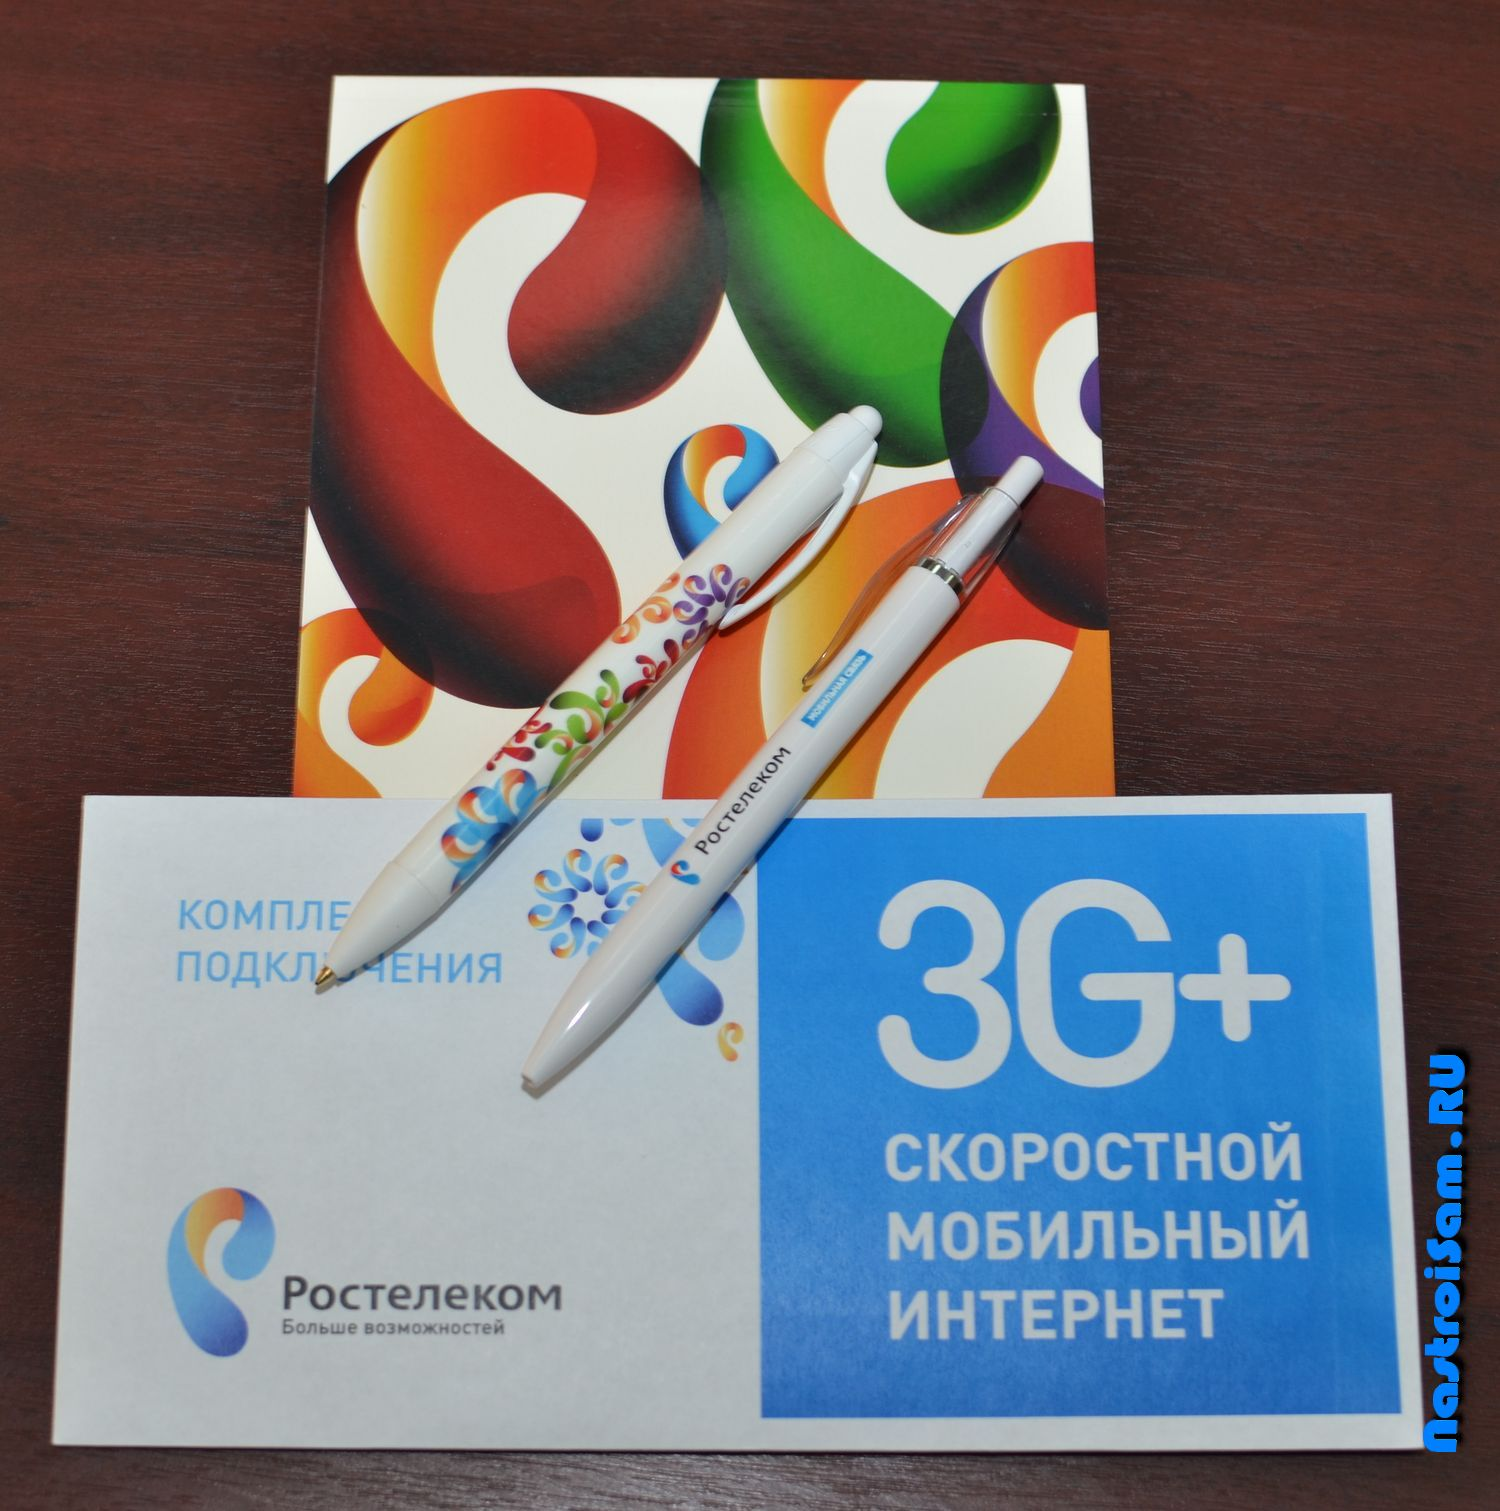 saratov_nss-3g_present-000